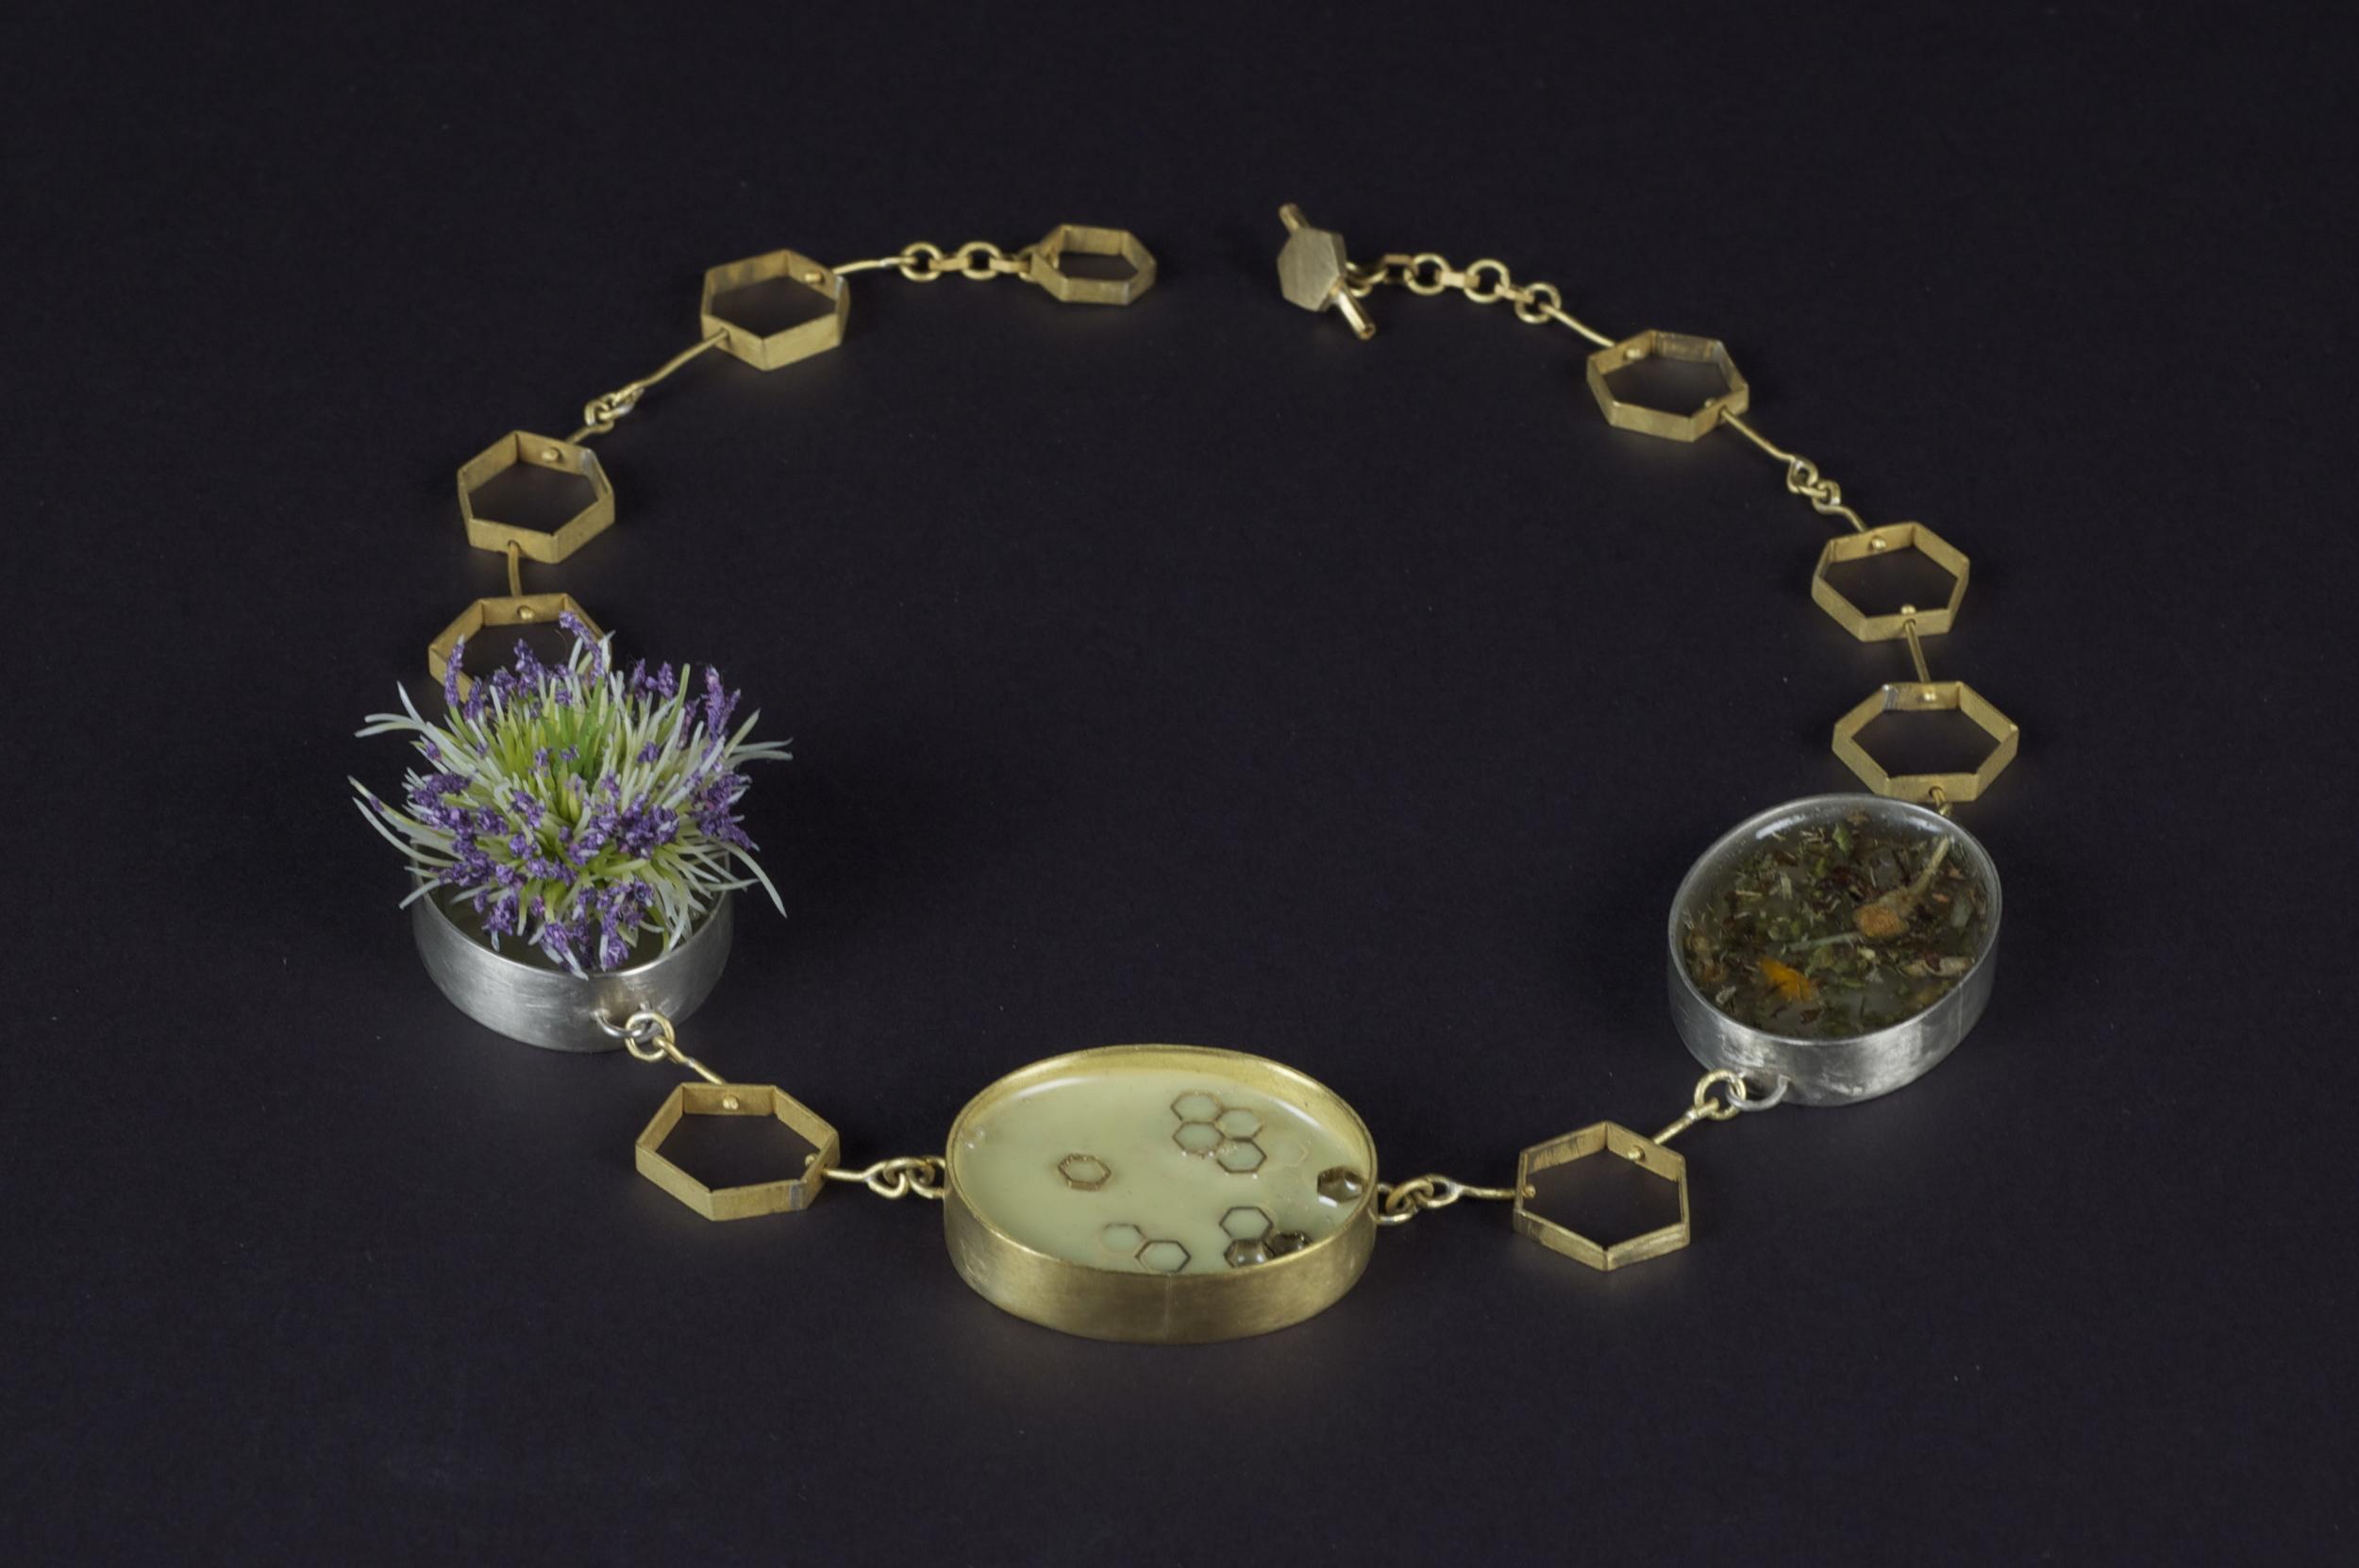 Symbiosis Neckpiece    brass, nickel, resin urethane, dried herbs and flowers, plastic flower